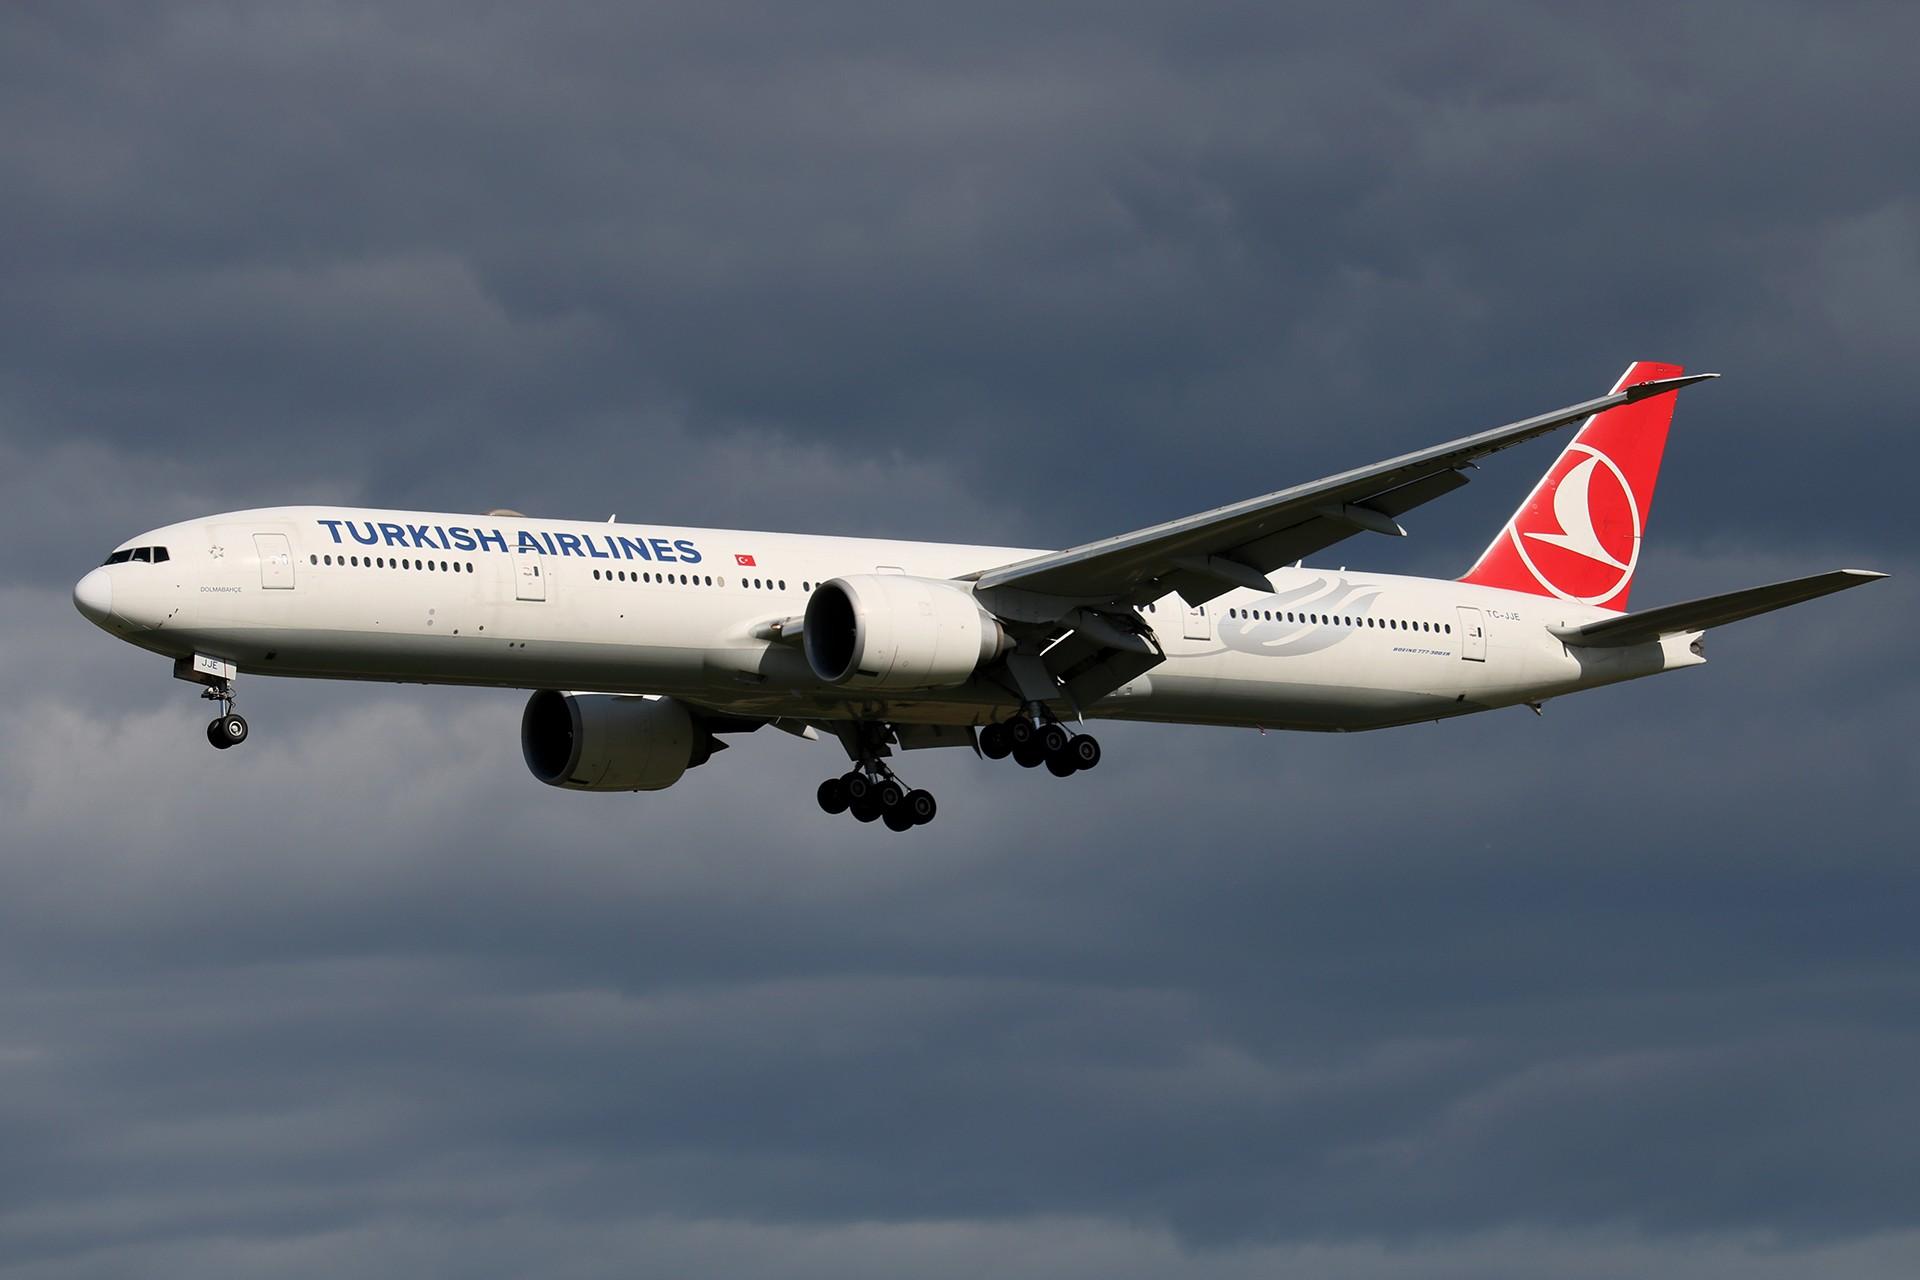 Re:[原创]LIULIU 【PEK 01】 好看的云Ⅳ 杂,很杂,是真的杂 BOEING 777-3F2ER TC-JJE 中国北京首都国际机场